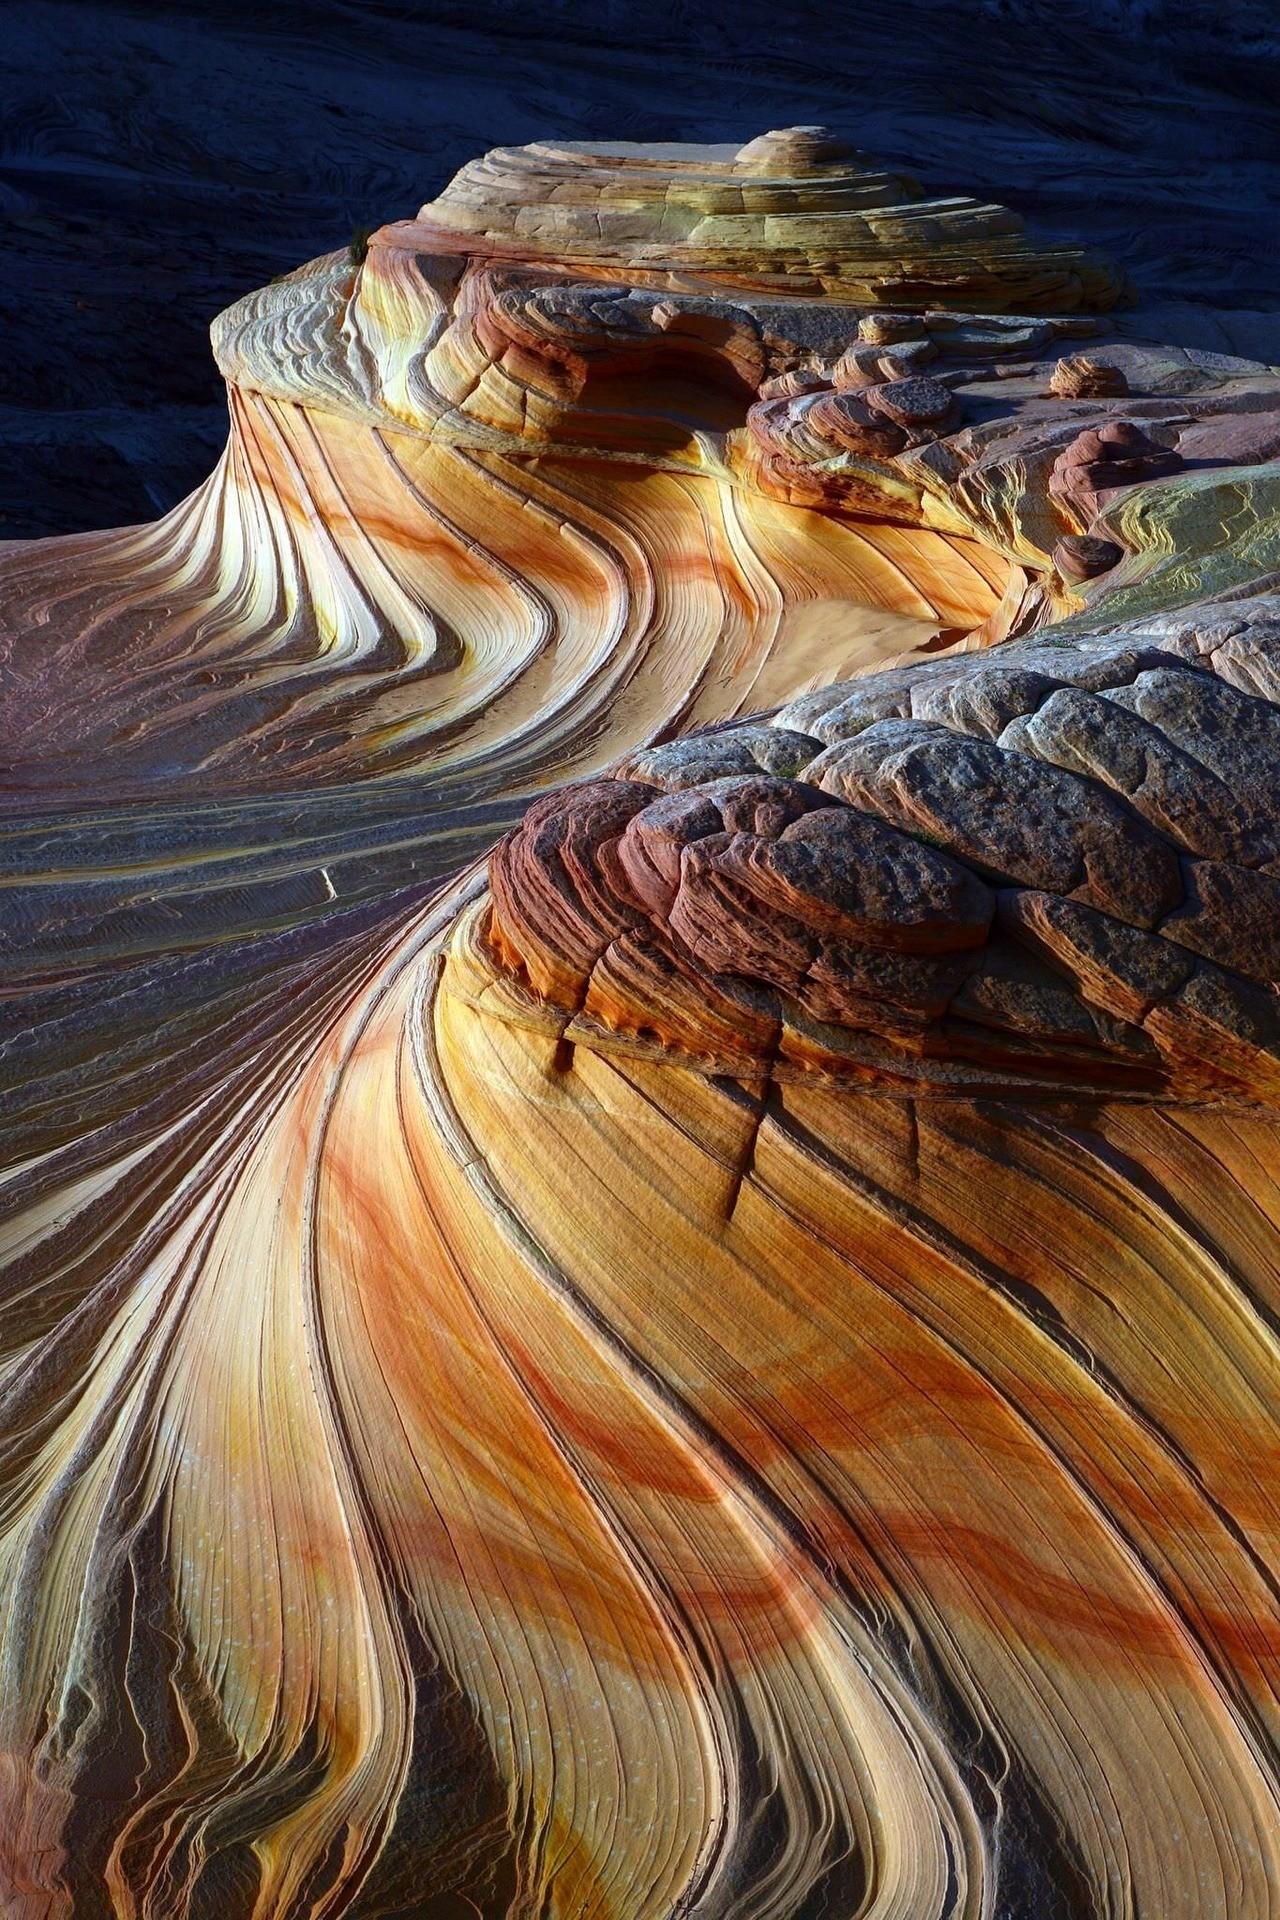 viola ⭐ The wave Paria Canyon-Vermillion Cliffs-Arizona ⭐ Shared by Alex ⭐⭐⭐